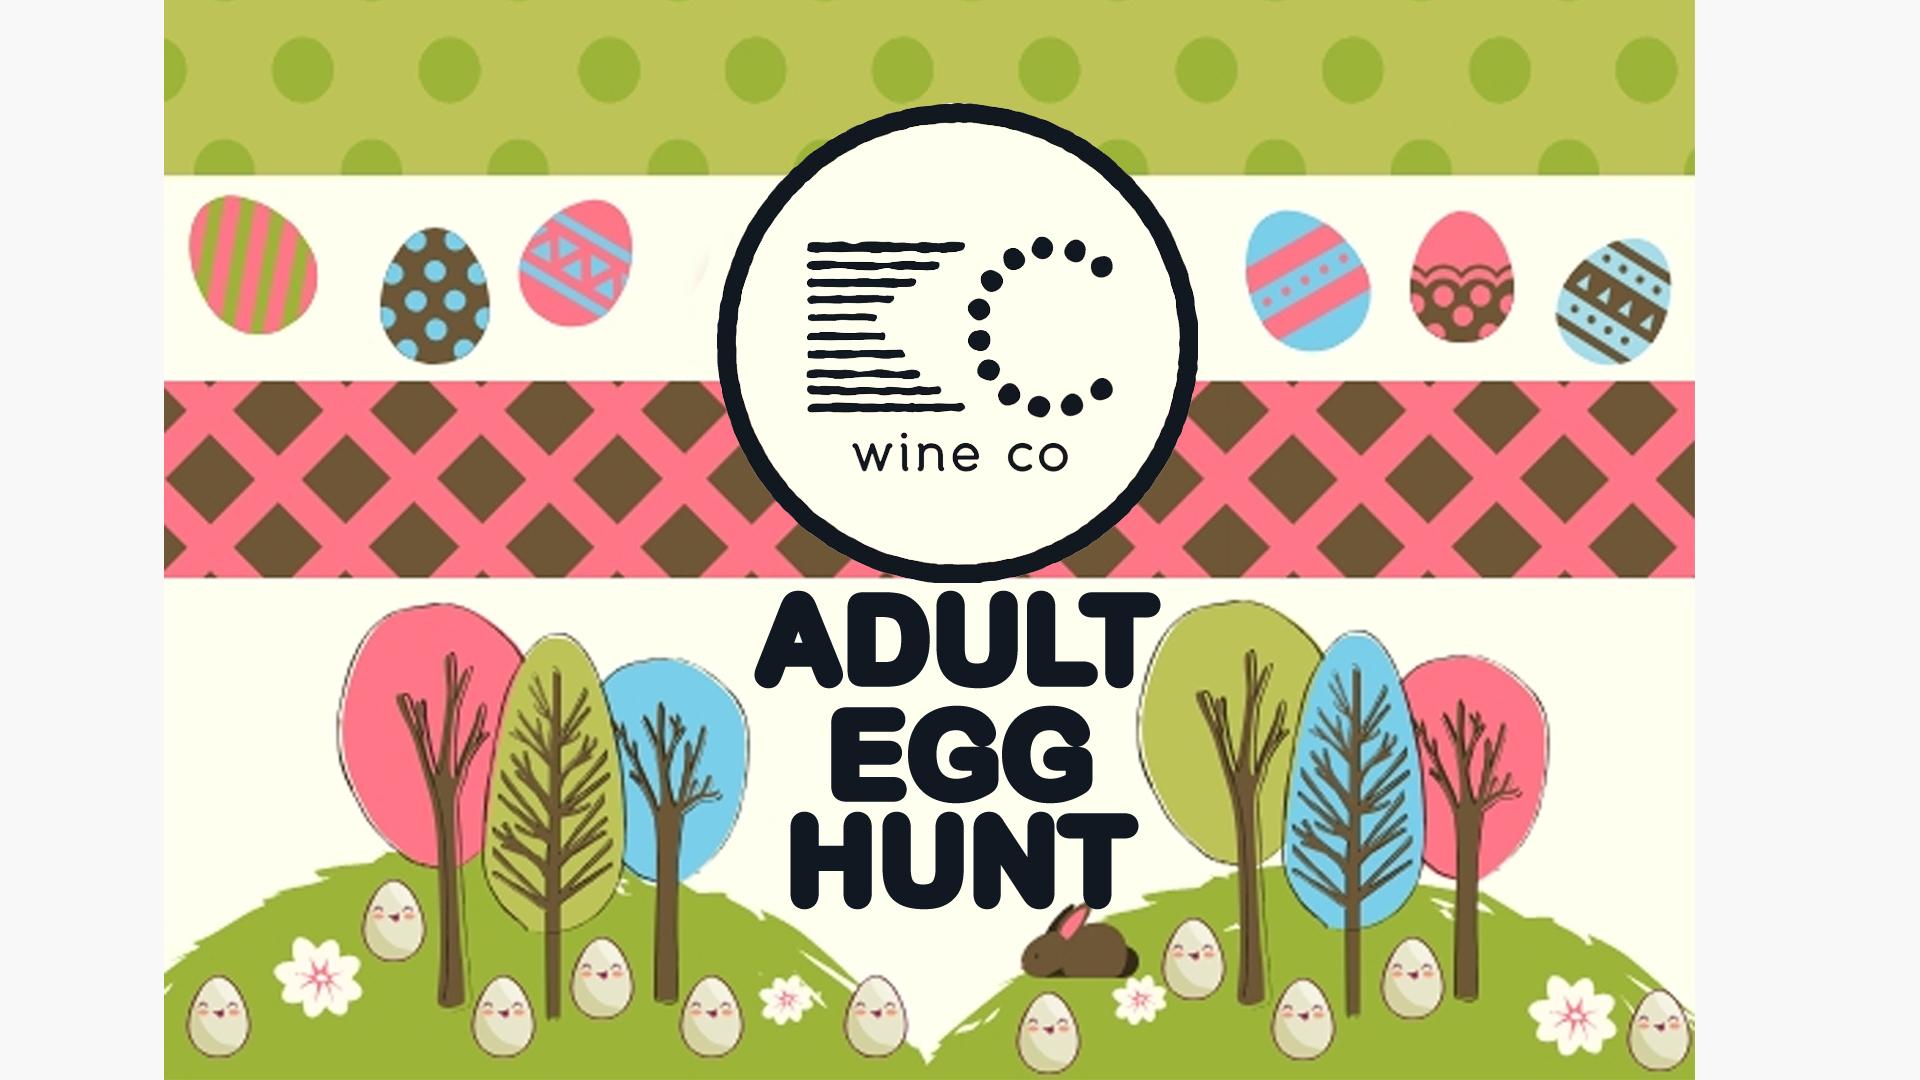 egg hunt holli 2.jpg